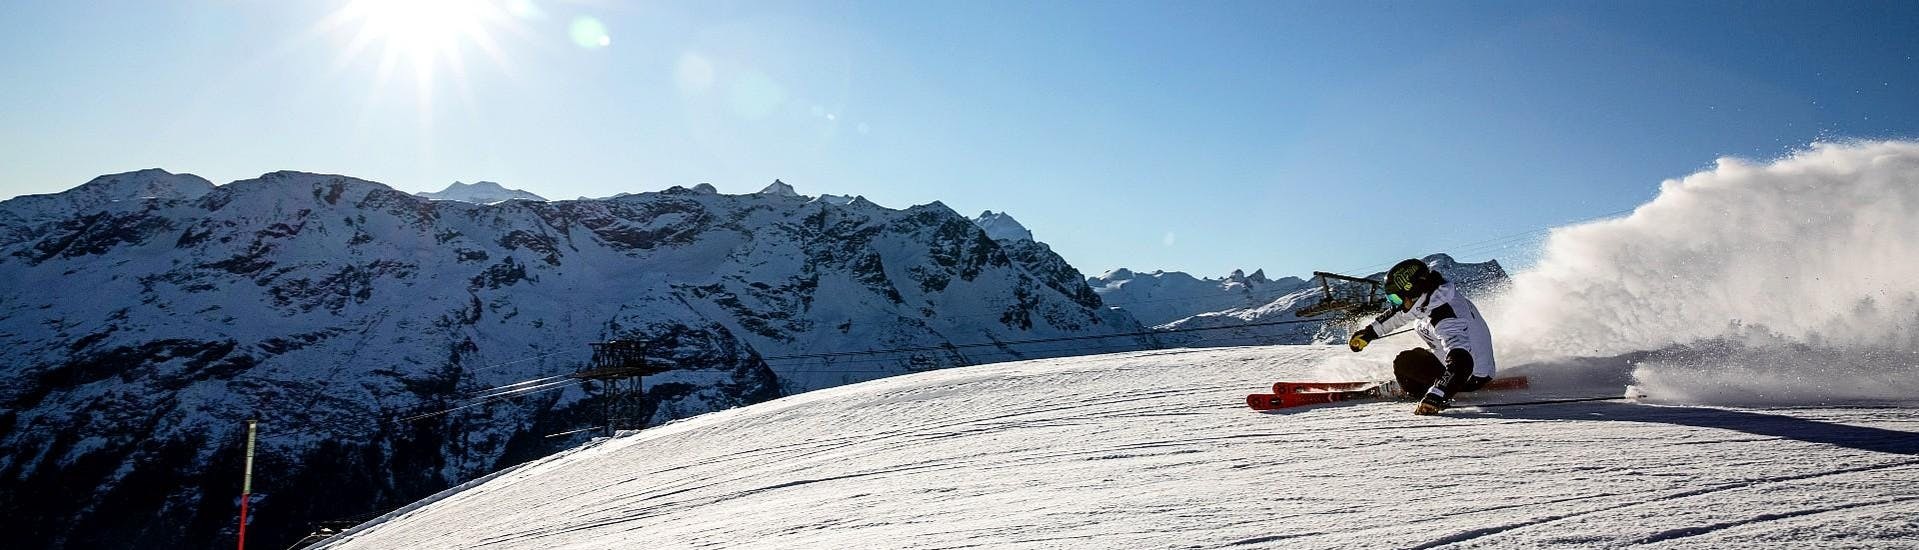 private-ski-lessons-for-adults-of-all-levels-giorgio-rocca-ski-academy-stmoritz-hero